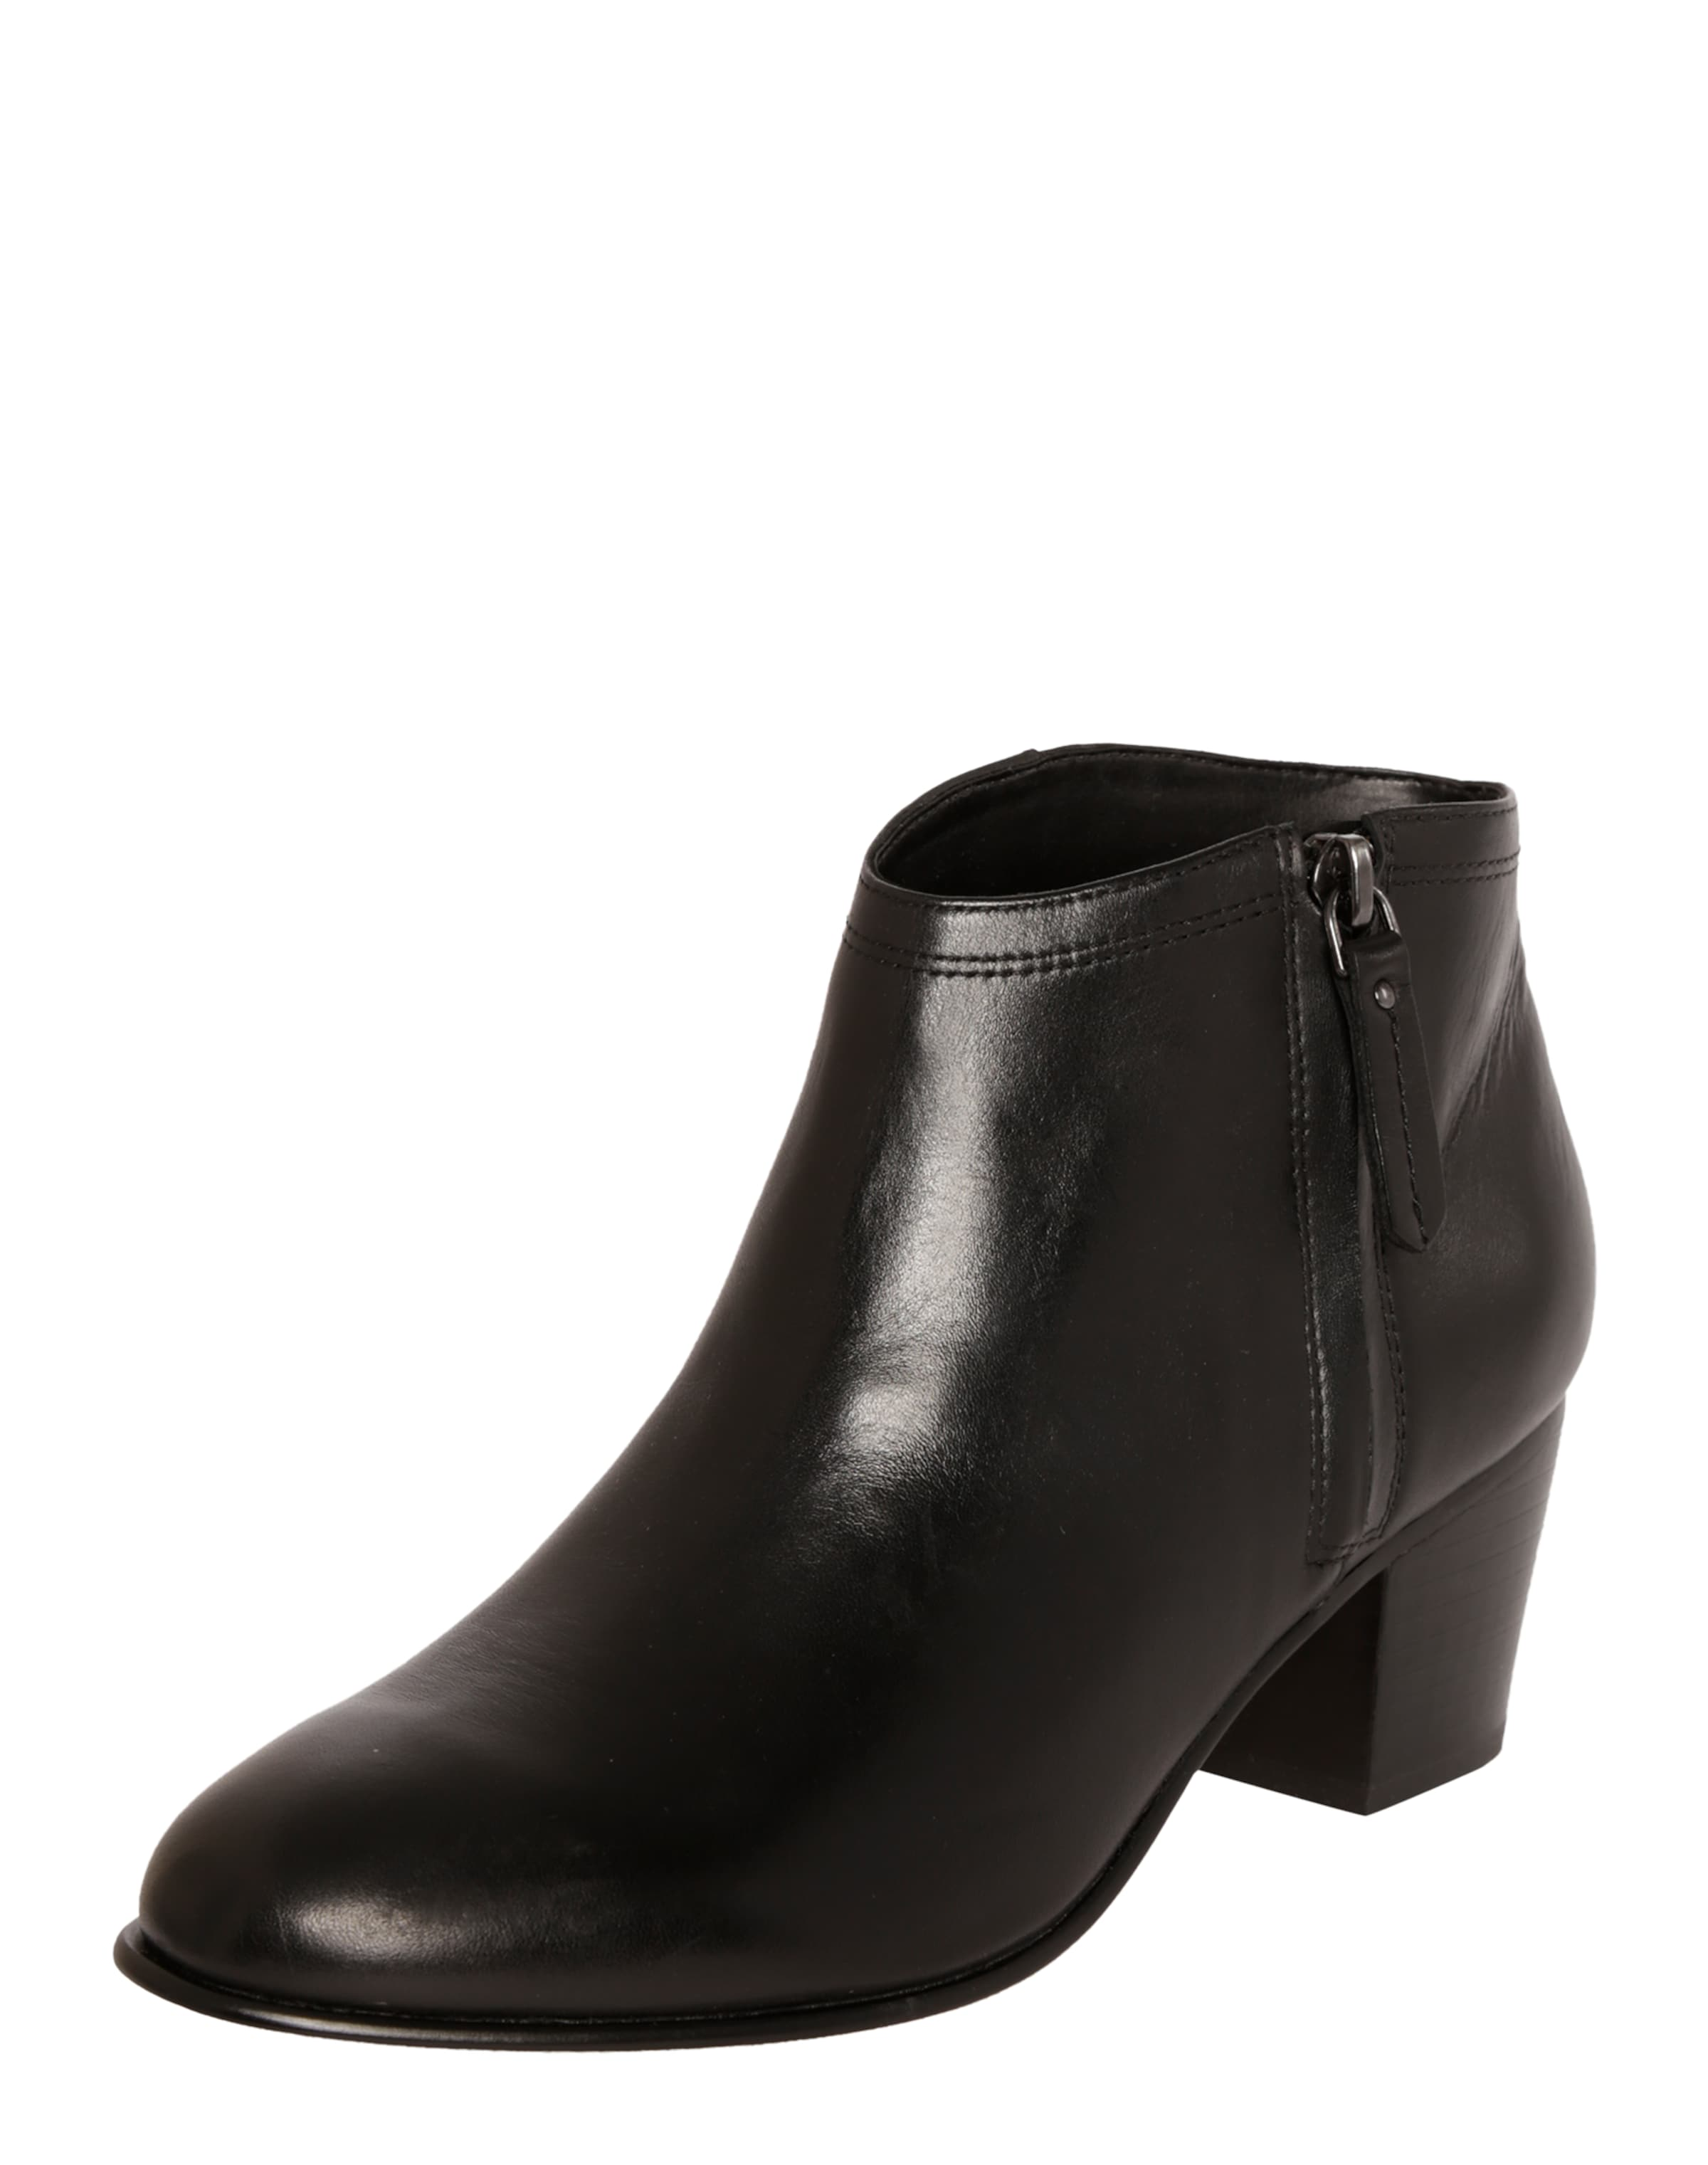 CLARKS | Ankle Boots 'Maypearl Alice' Schuhe Gut getragene Schuhe